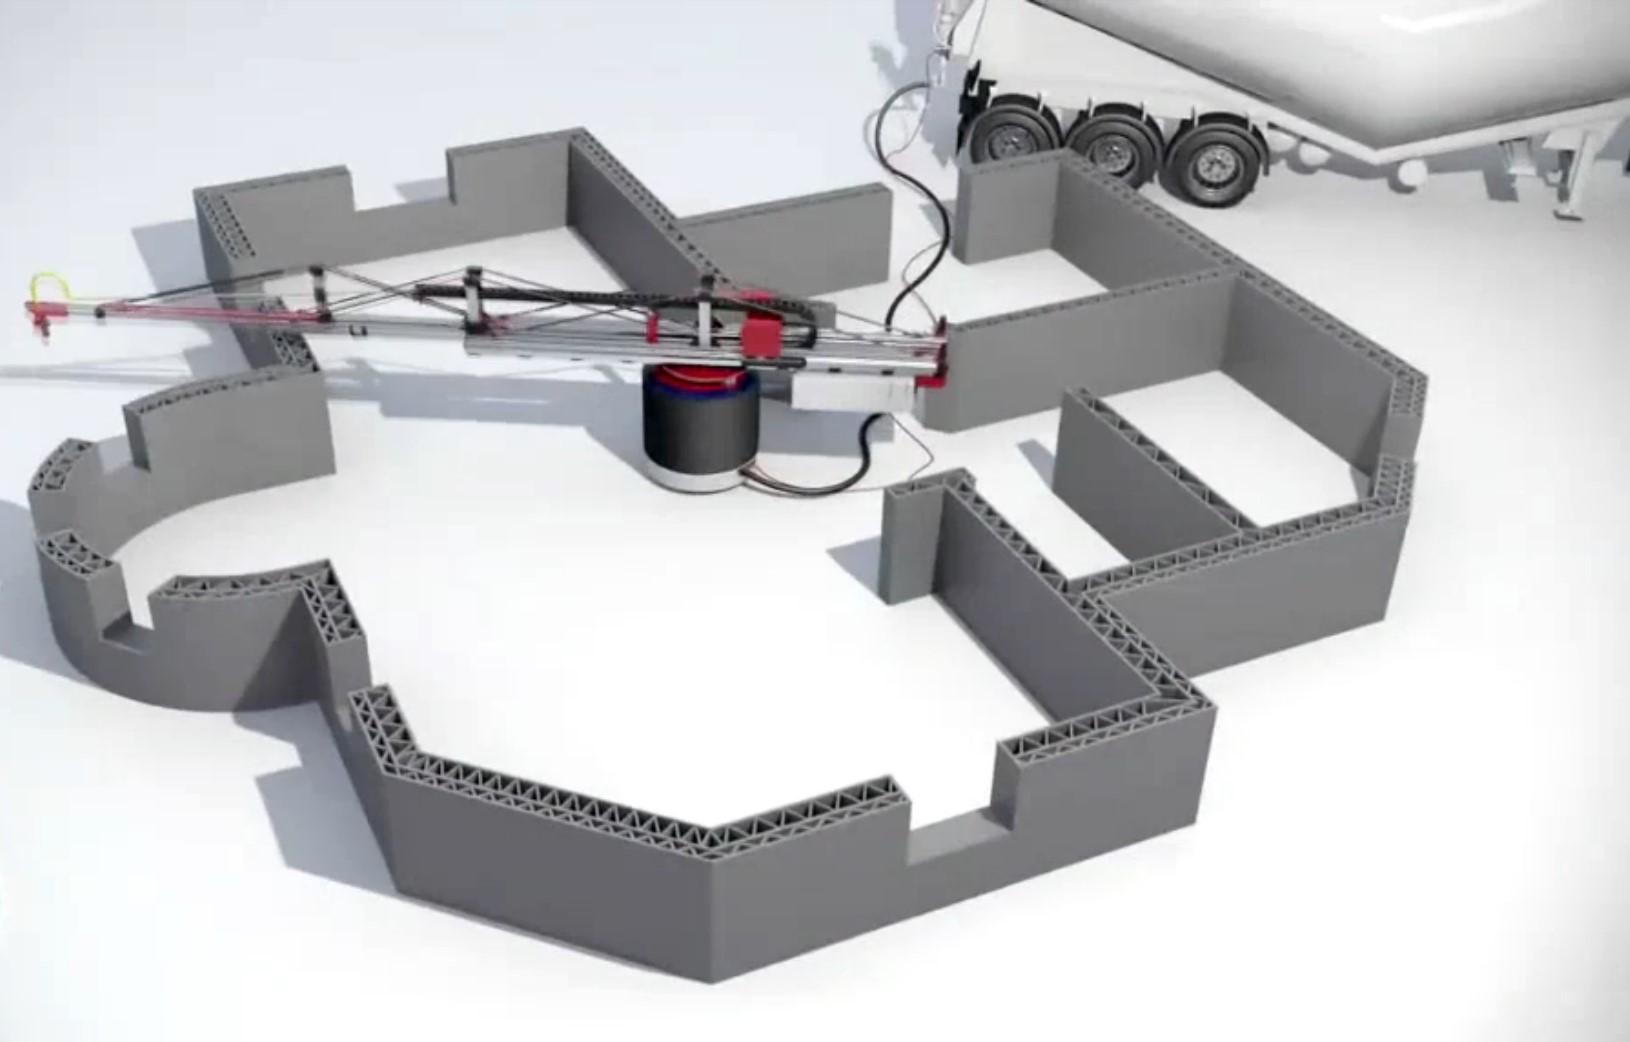 La impresora 3d capaz de construir una casa en un d a Impresion 3d construccion